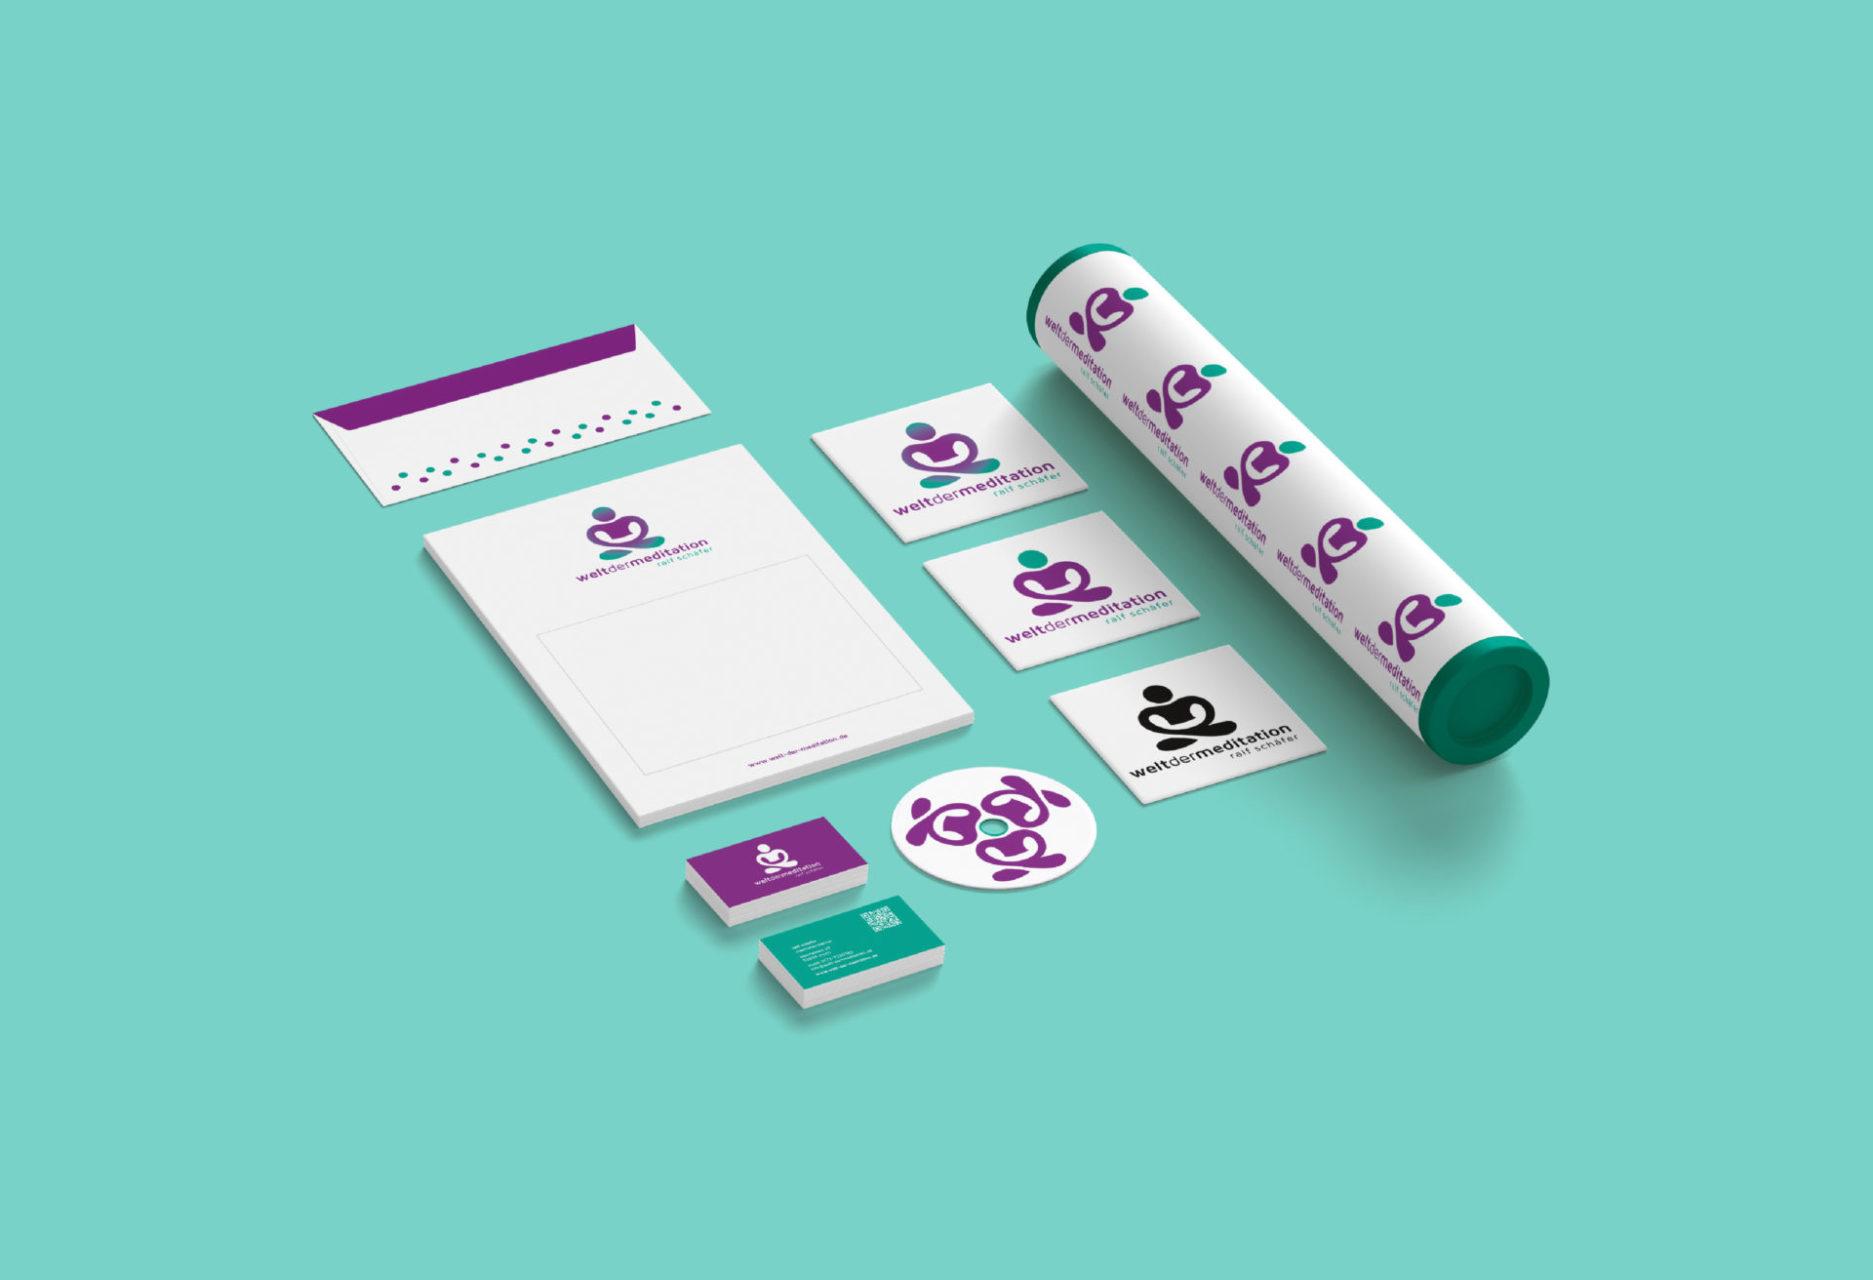 Welt Der Meditation Referenz 5 Print Druck Visitenkarte Cd Umschlag Briefpapier Briefumschlag